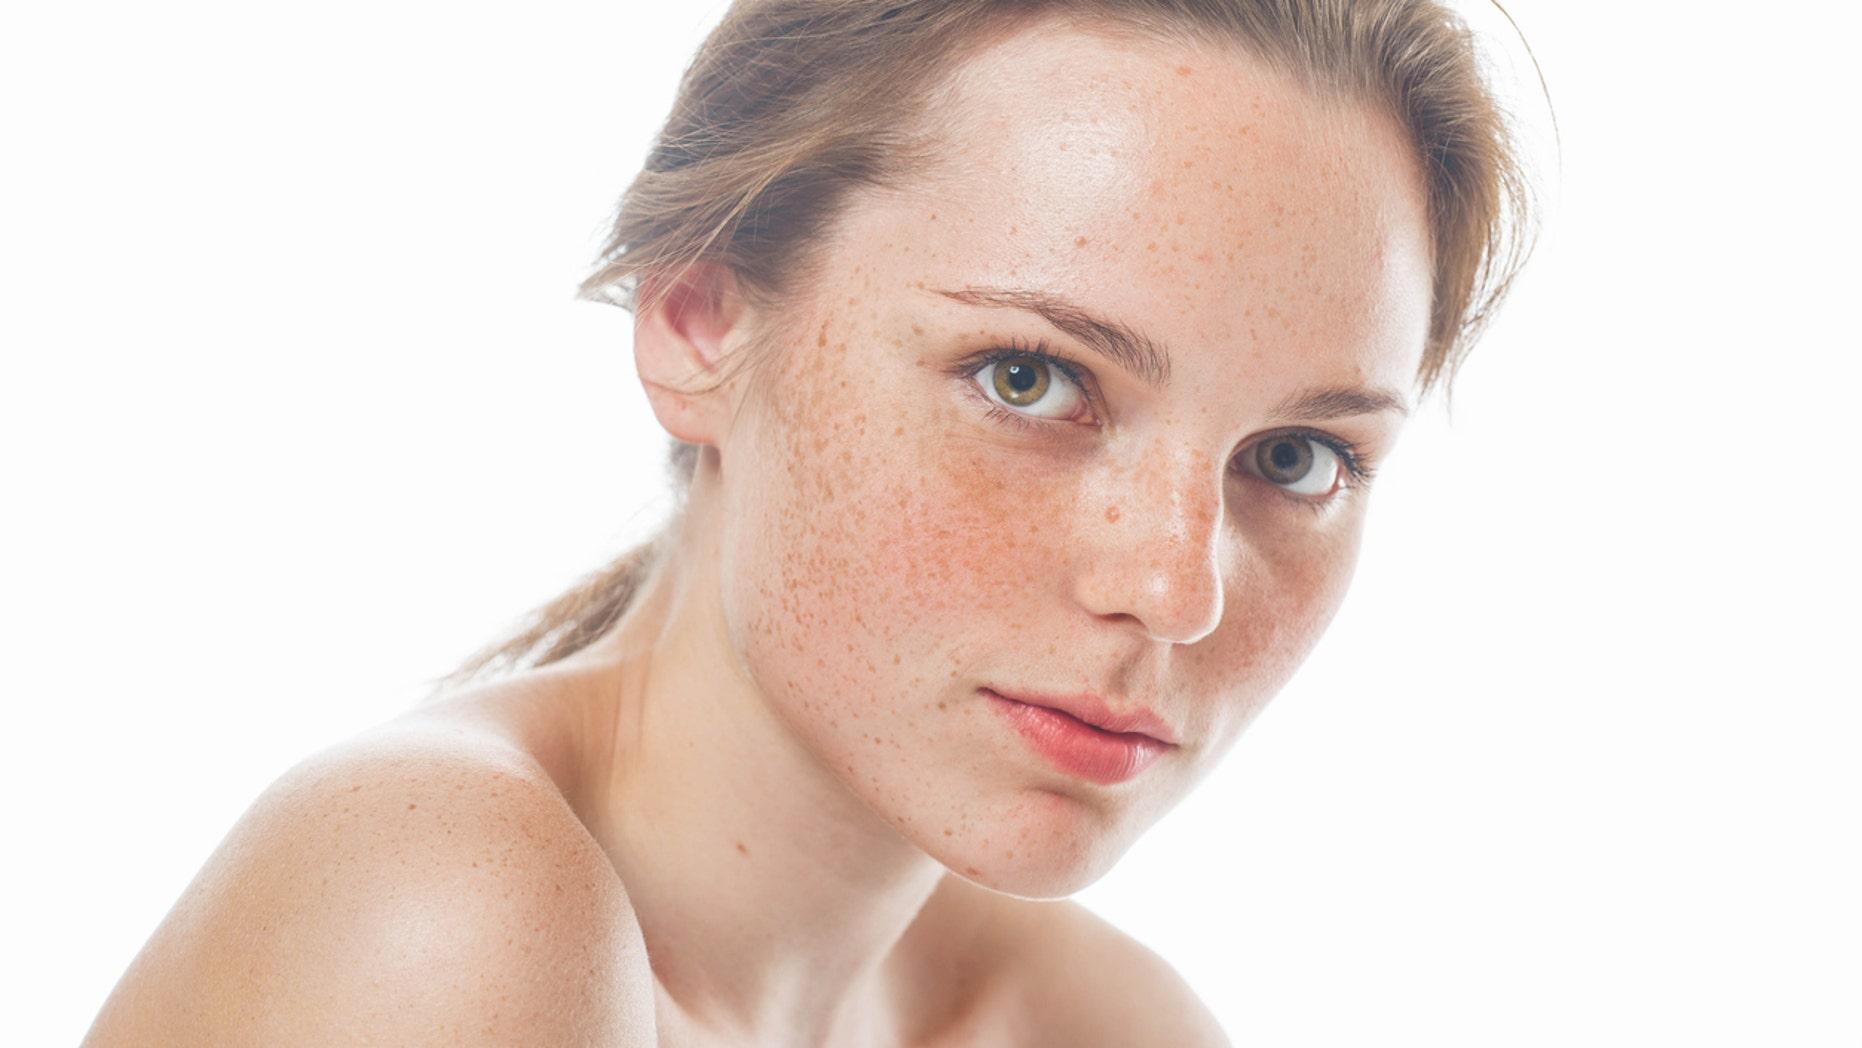 Woman studio beauty portrait happy healthy skin  with long hair